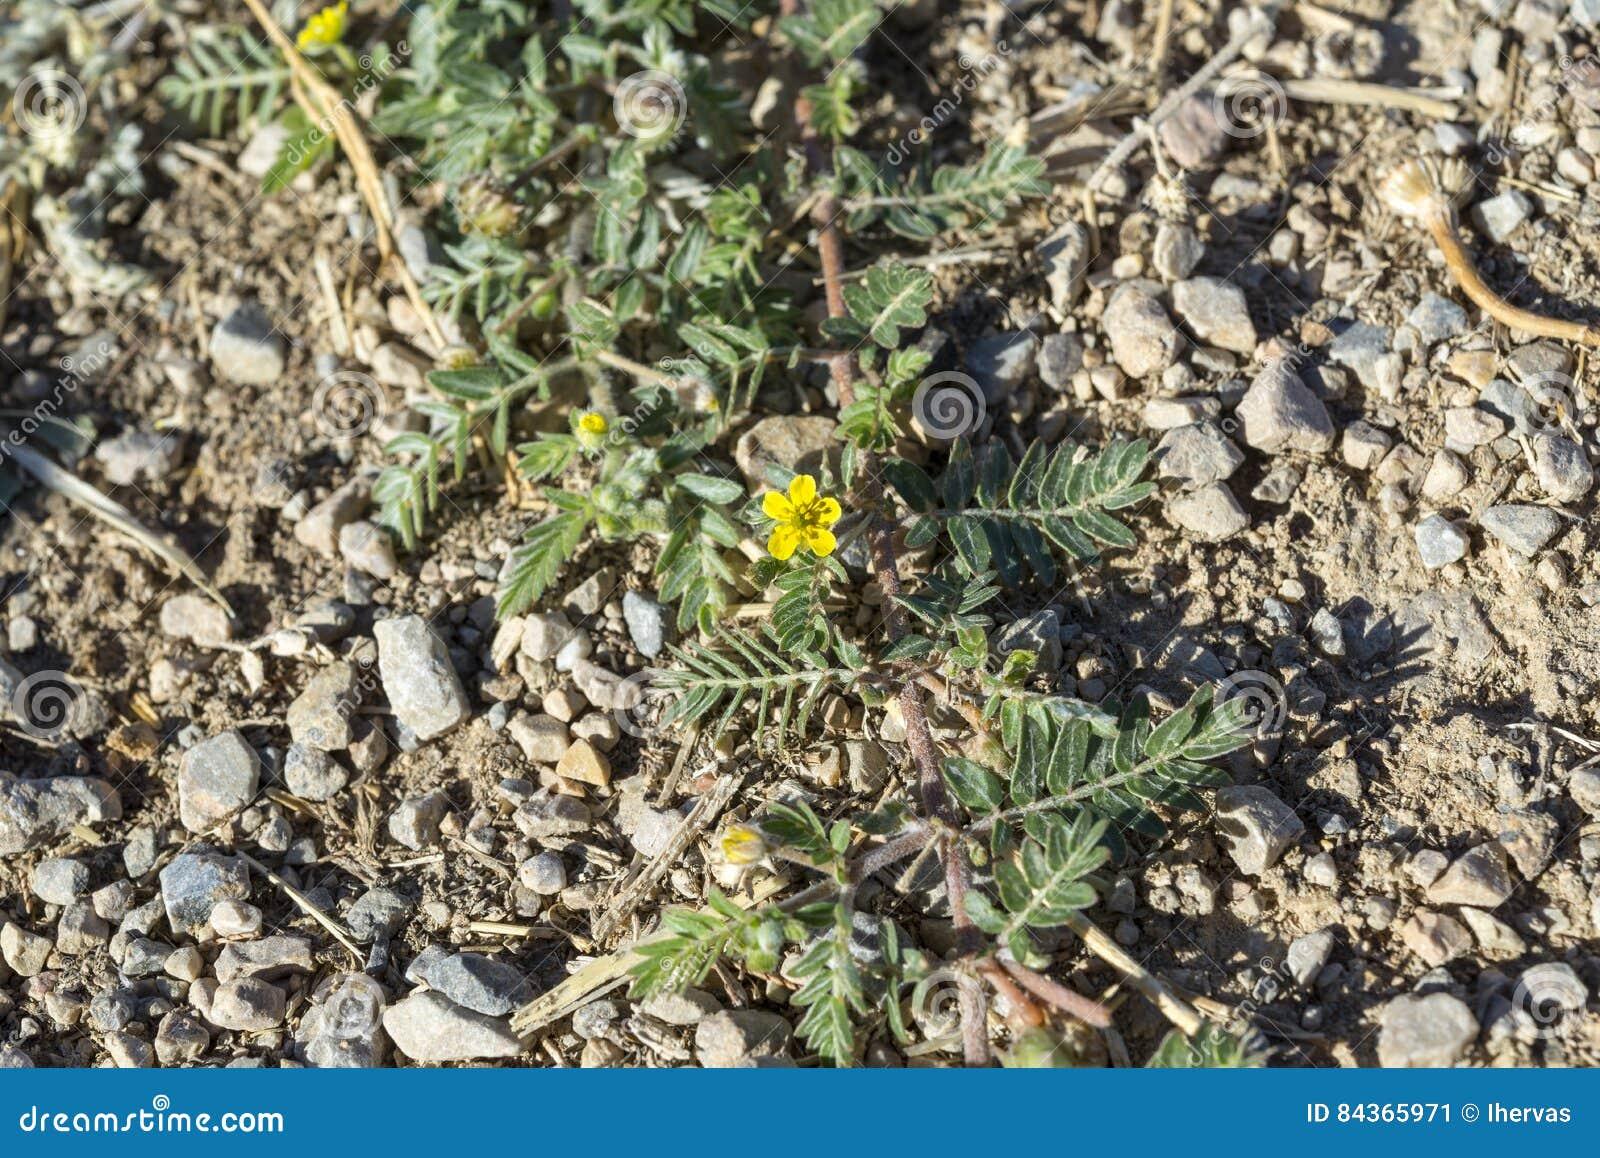 Leaves And Flowers Of Tribulus Terrestris Stock Image Download Macro